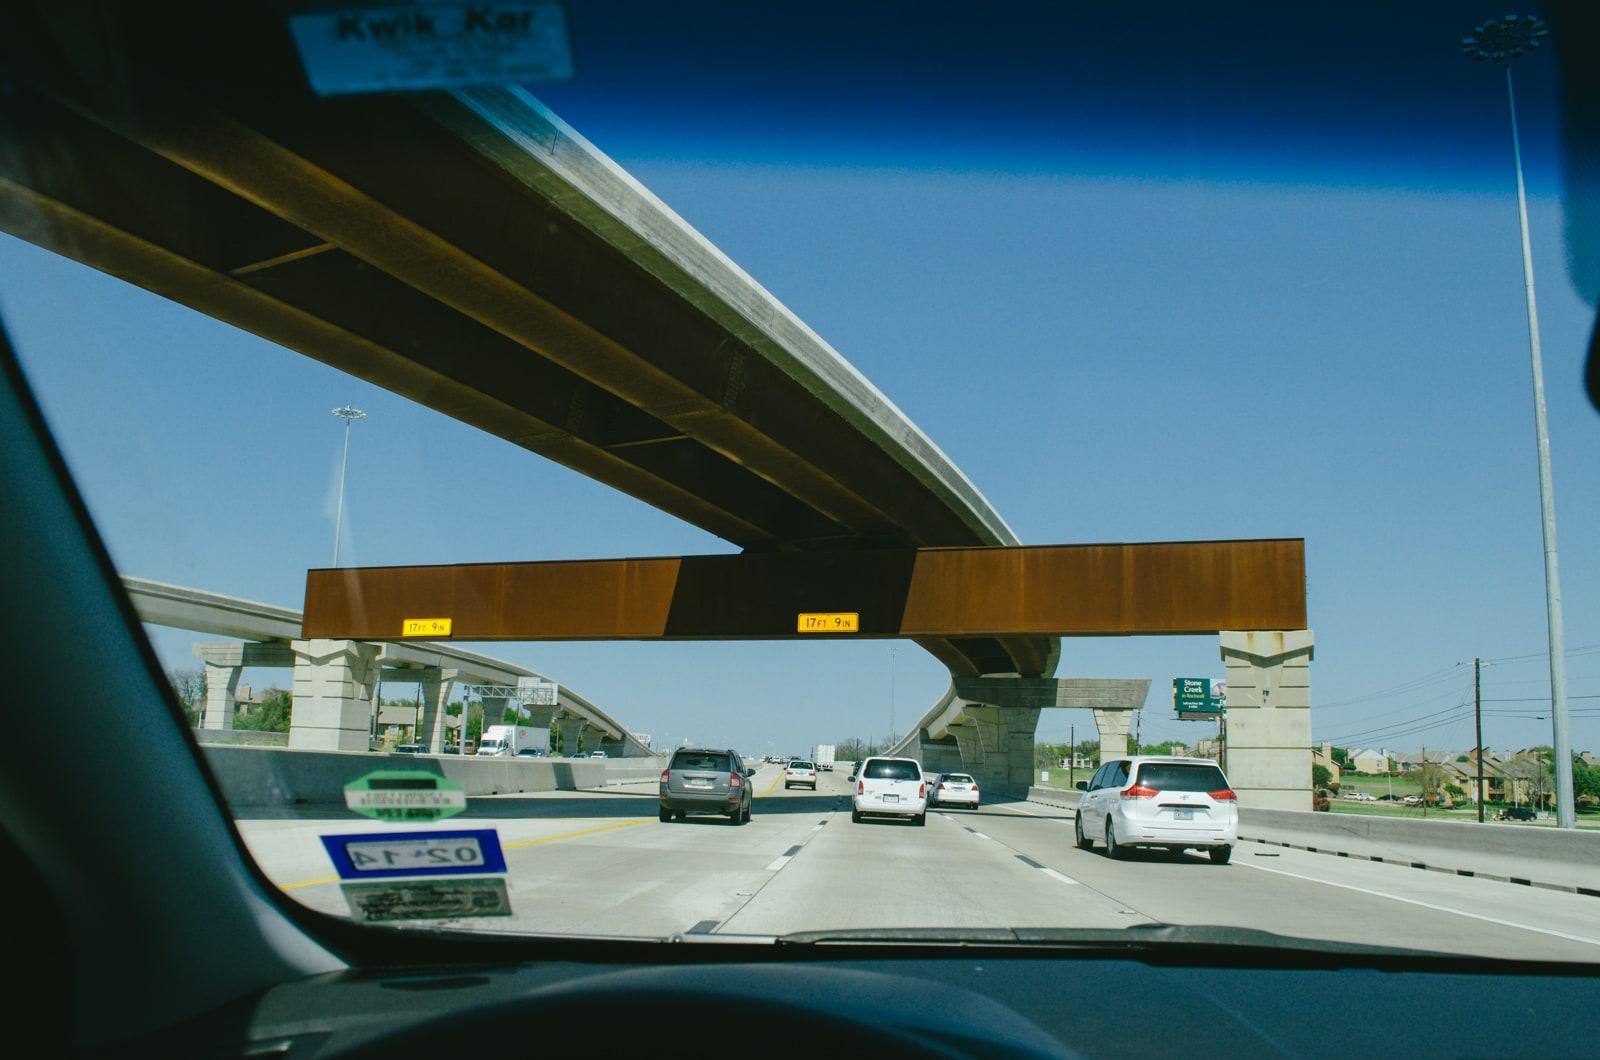 Driving under a bridge on 635